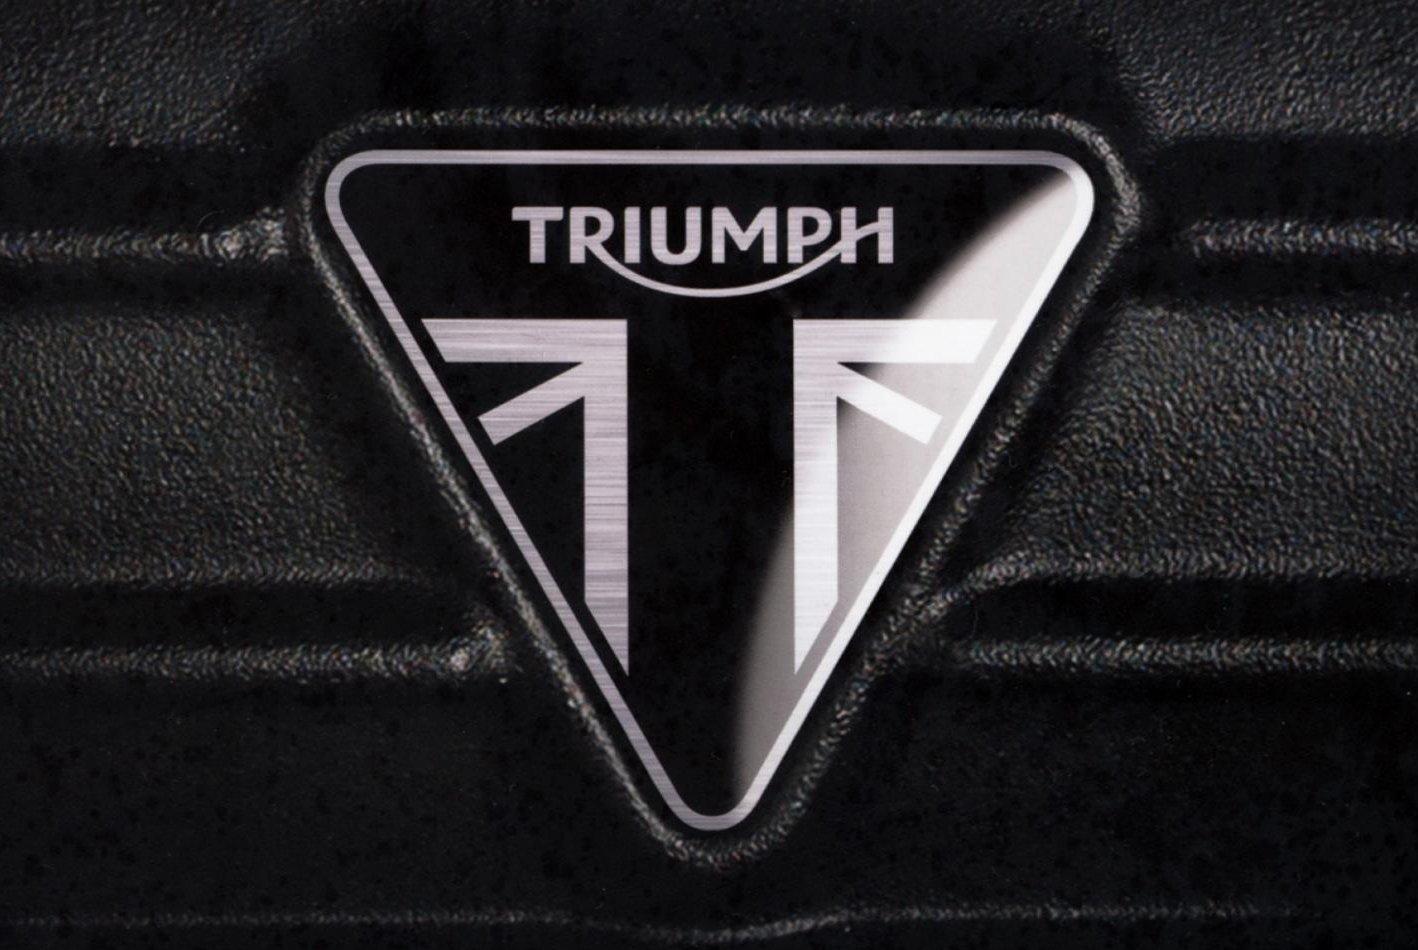 le logo moto triumph embleme sigle lancia. Black Bedroom Furniture Sets. Home Design Ideas